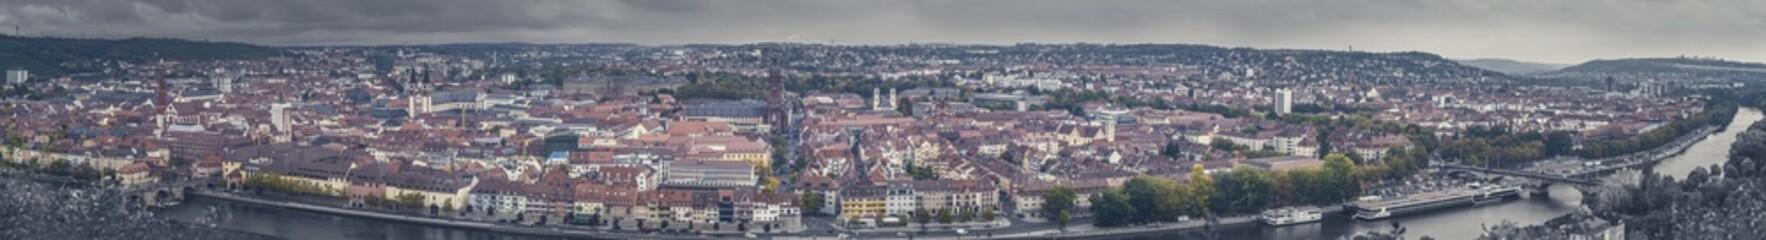 Foto op Canvas Big panorama city view of Würzburg with dramatic sky, Frankonia, Bavaria Germany